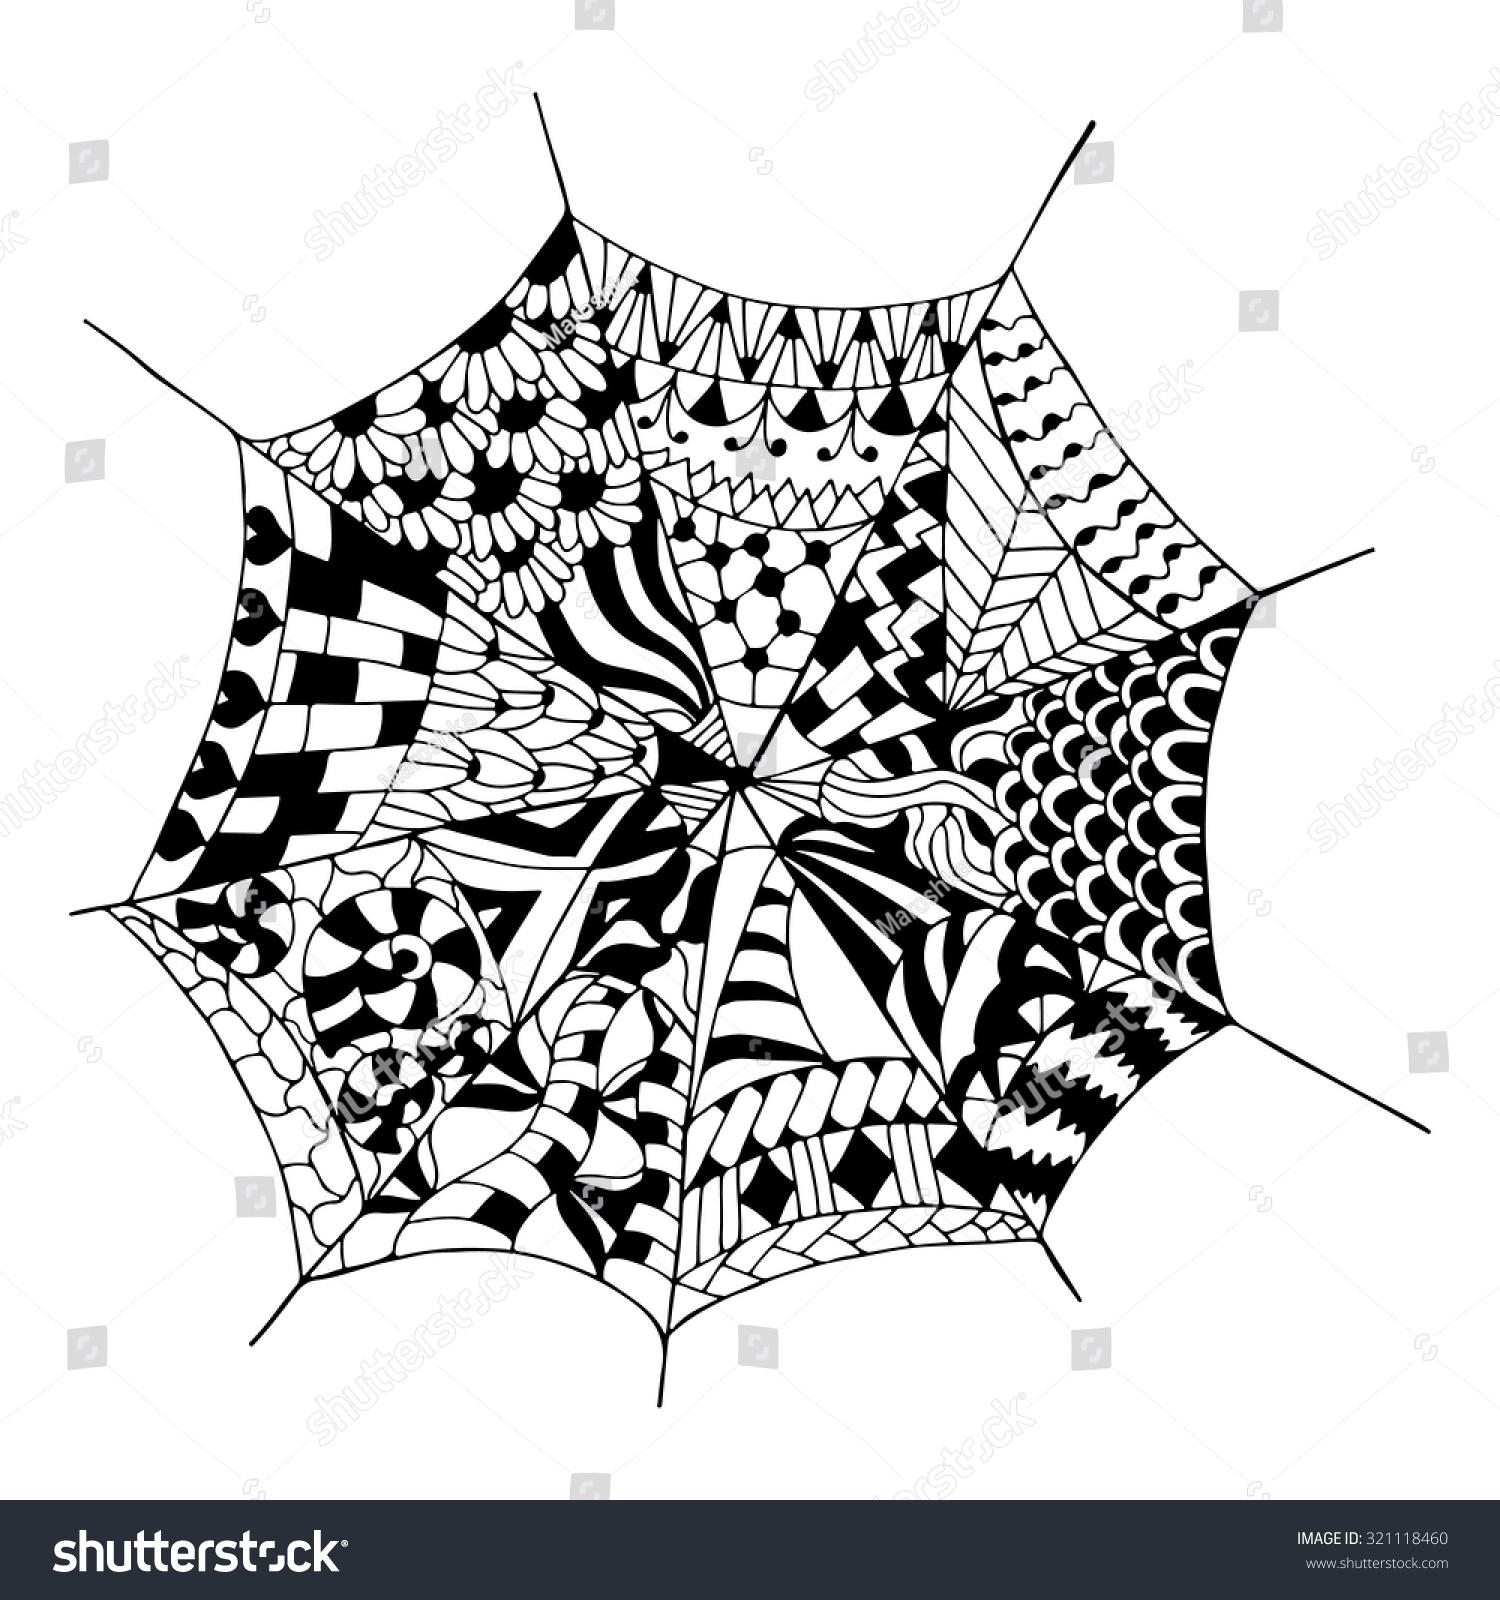 Hand Drawn Spider Web Anti Stress Stock Vector 321118460 - Shutterstock